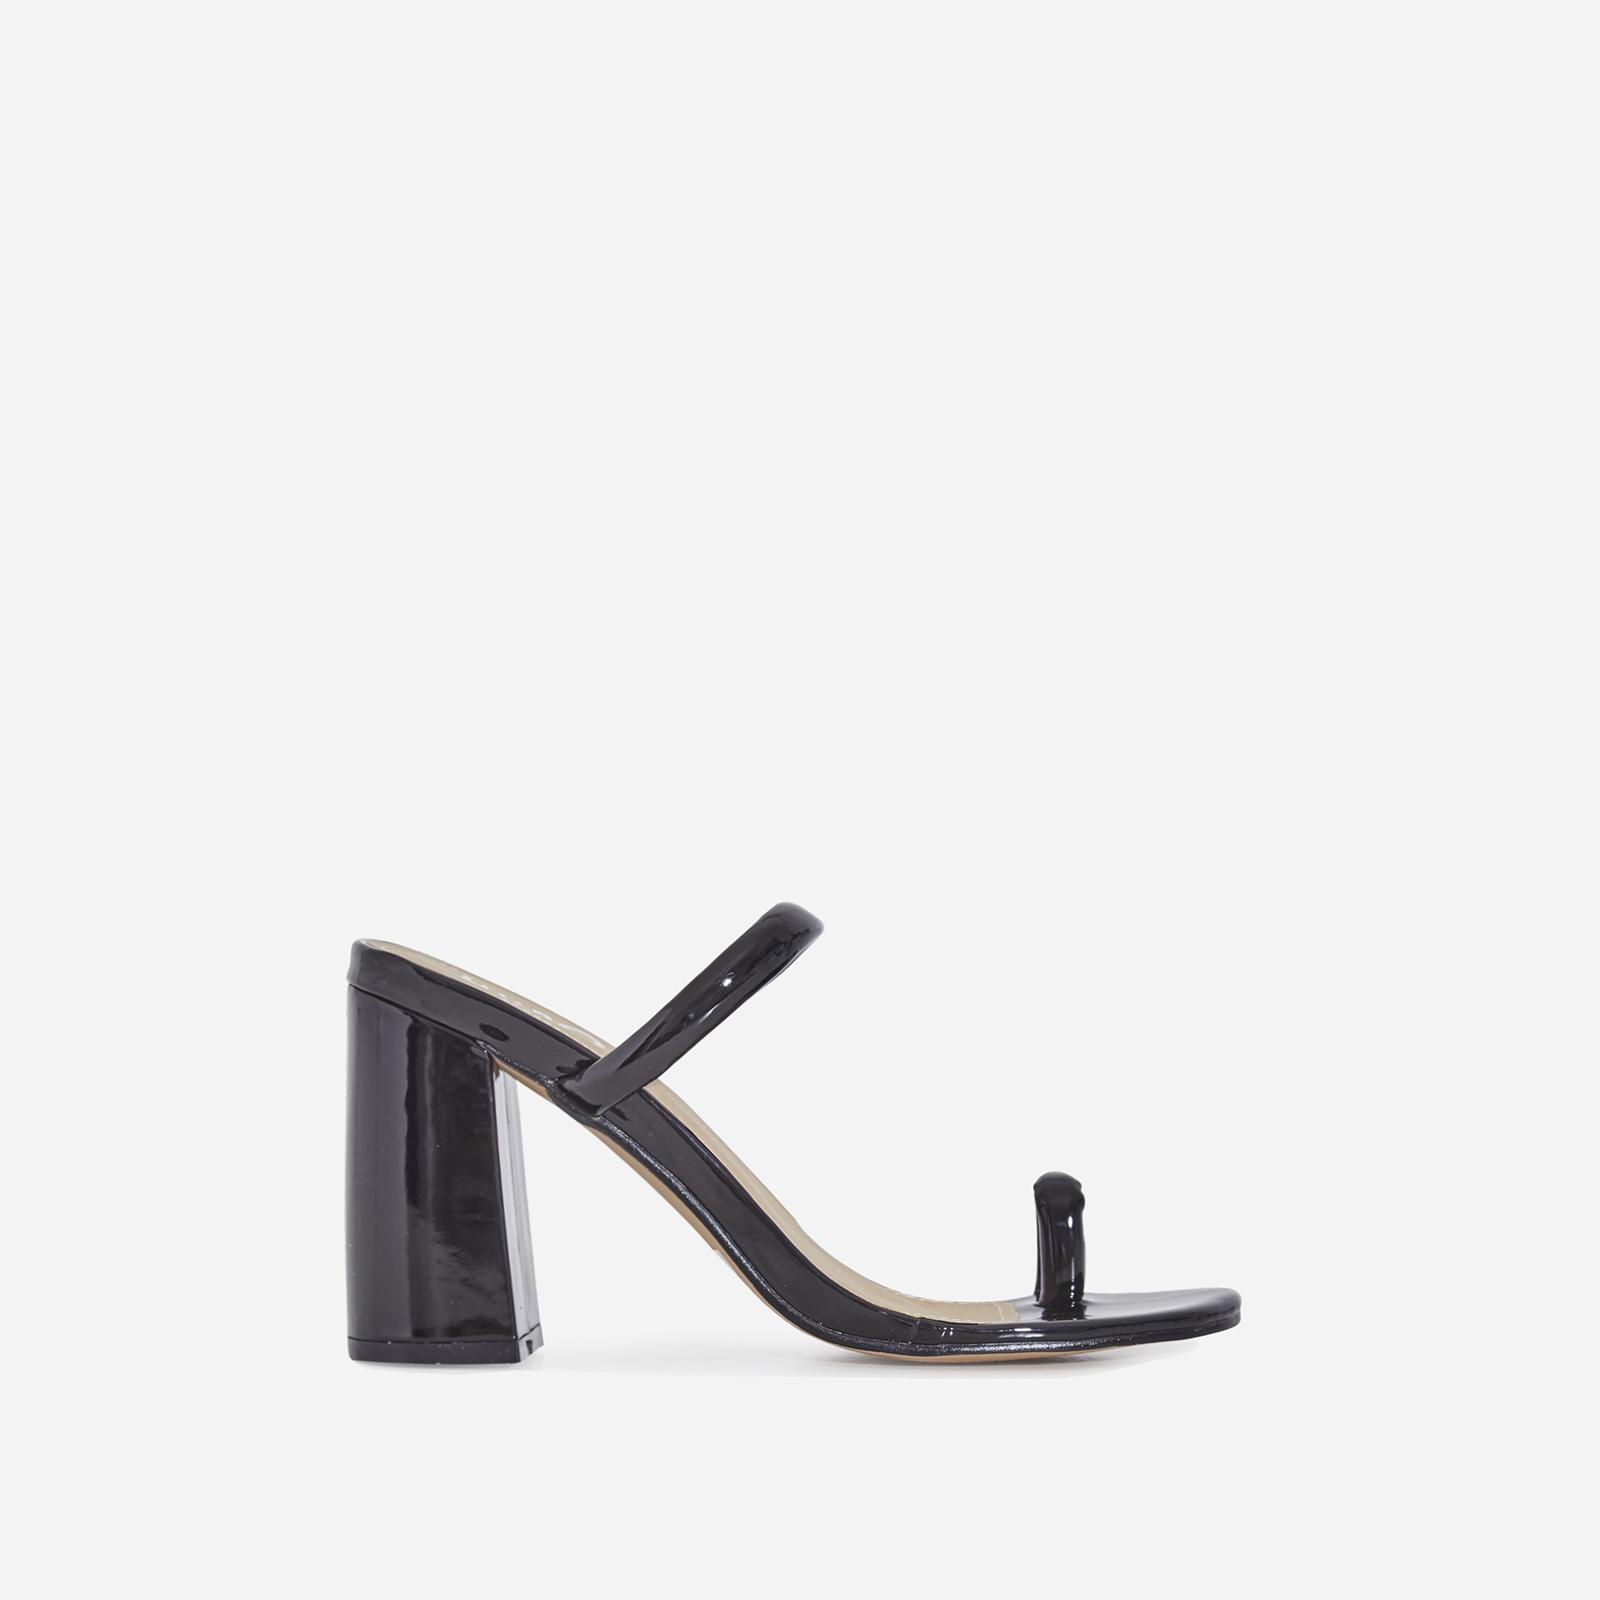 Kourt Toe Strap Black Heel Mule In Black Patent